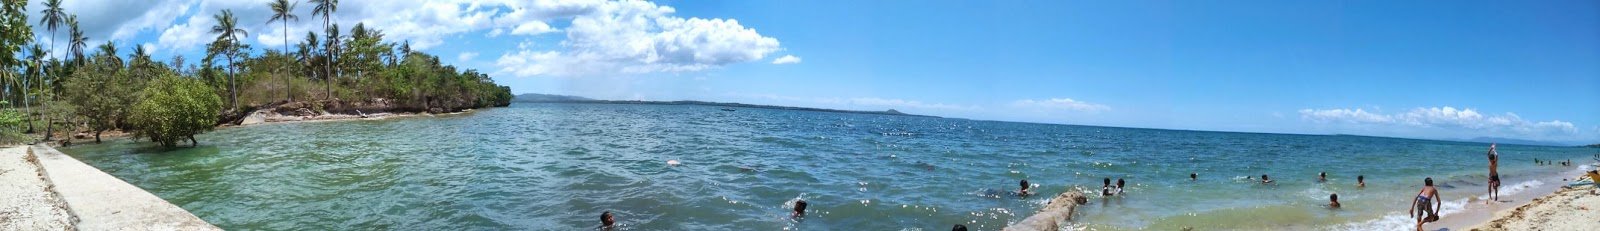 Mactang Historical Beach, Poro, Camotes, Cebu